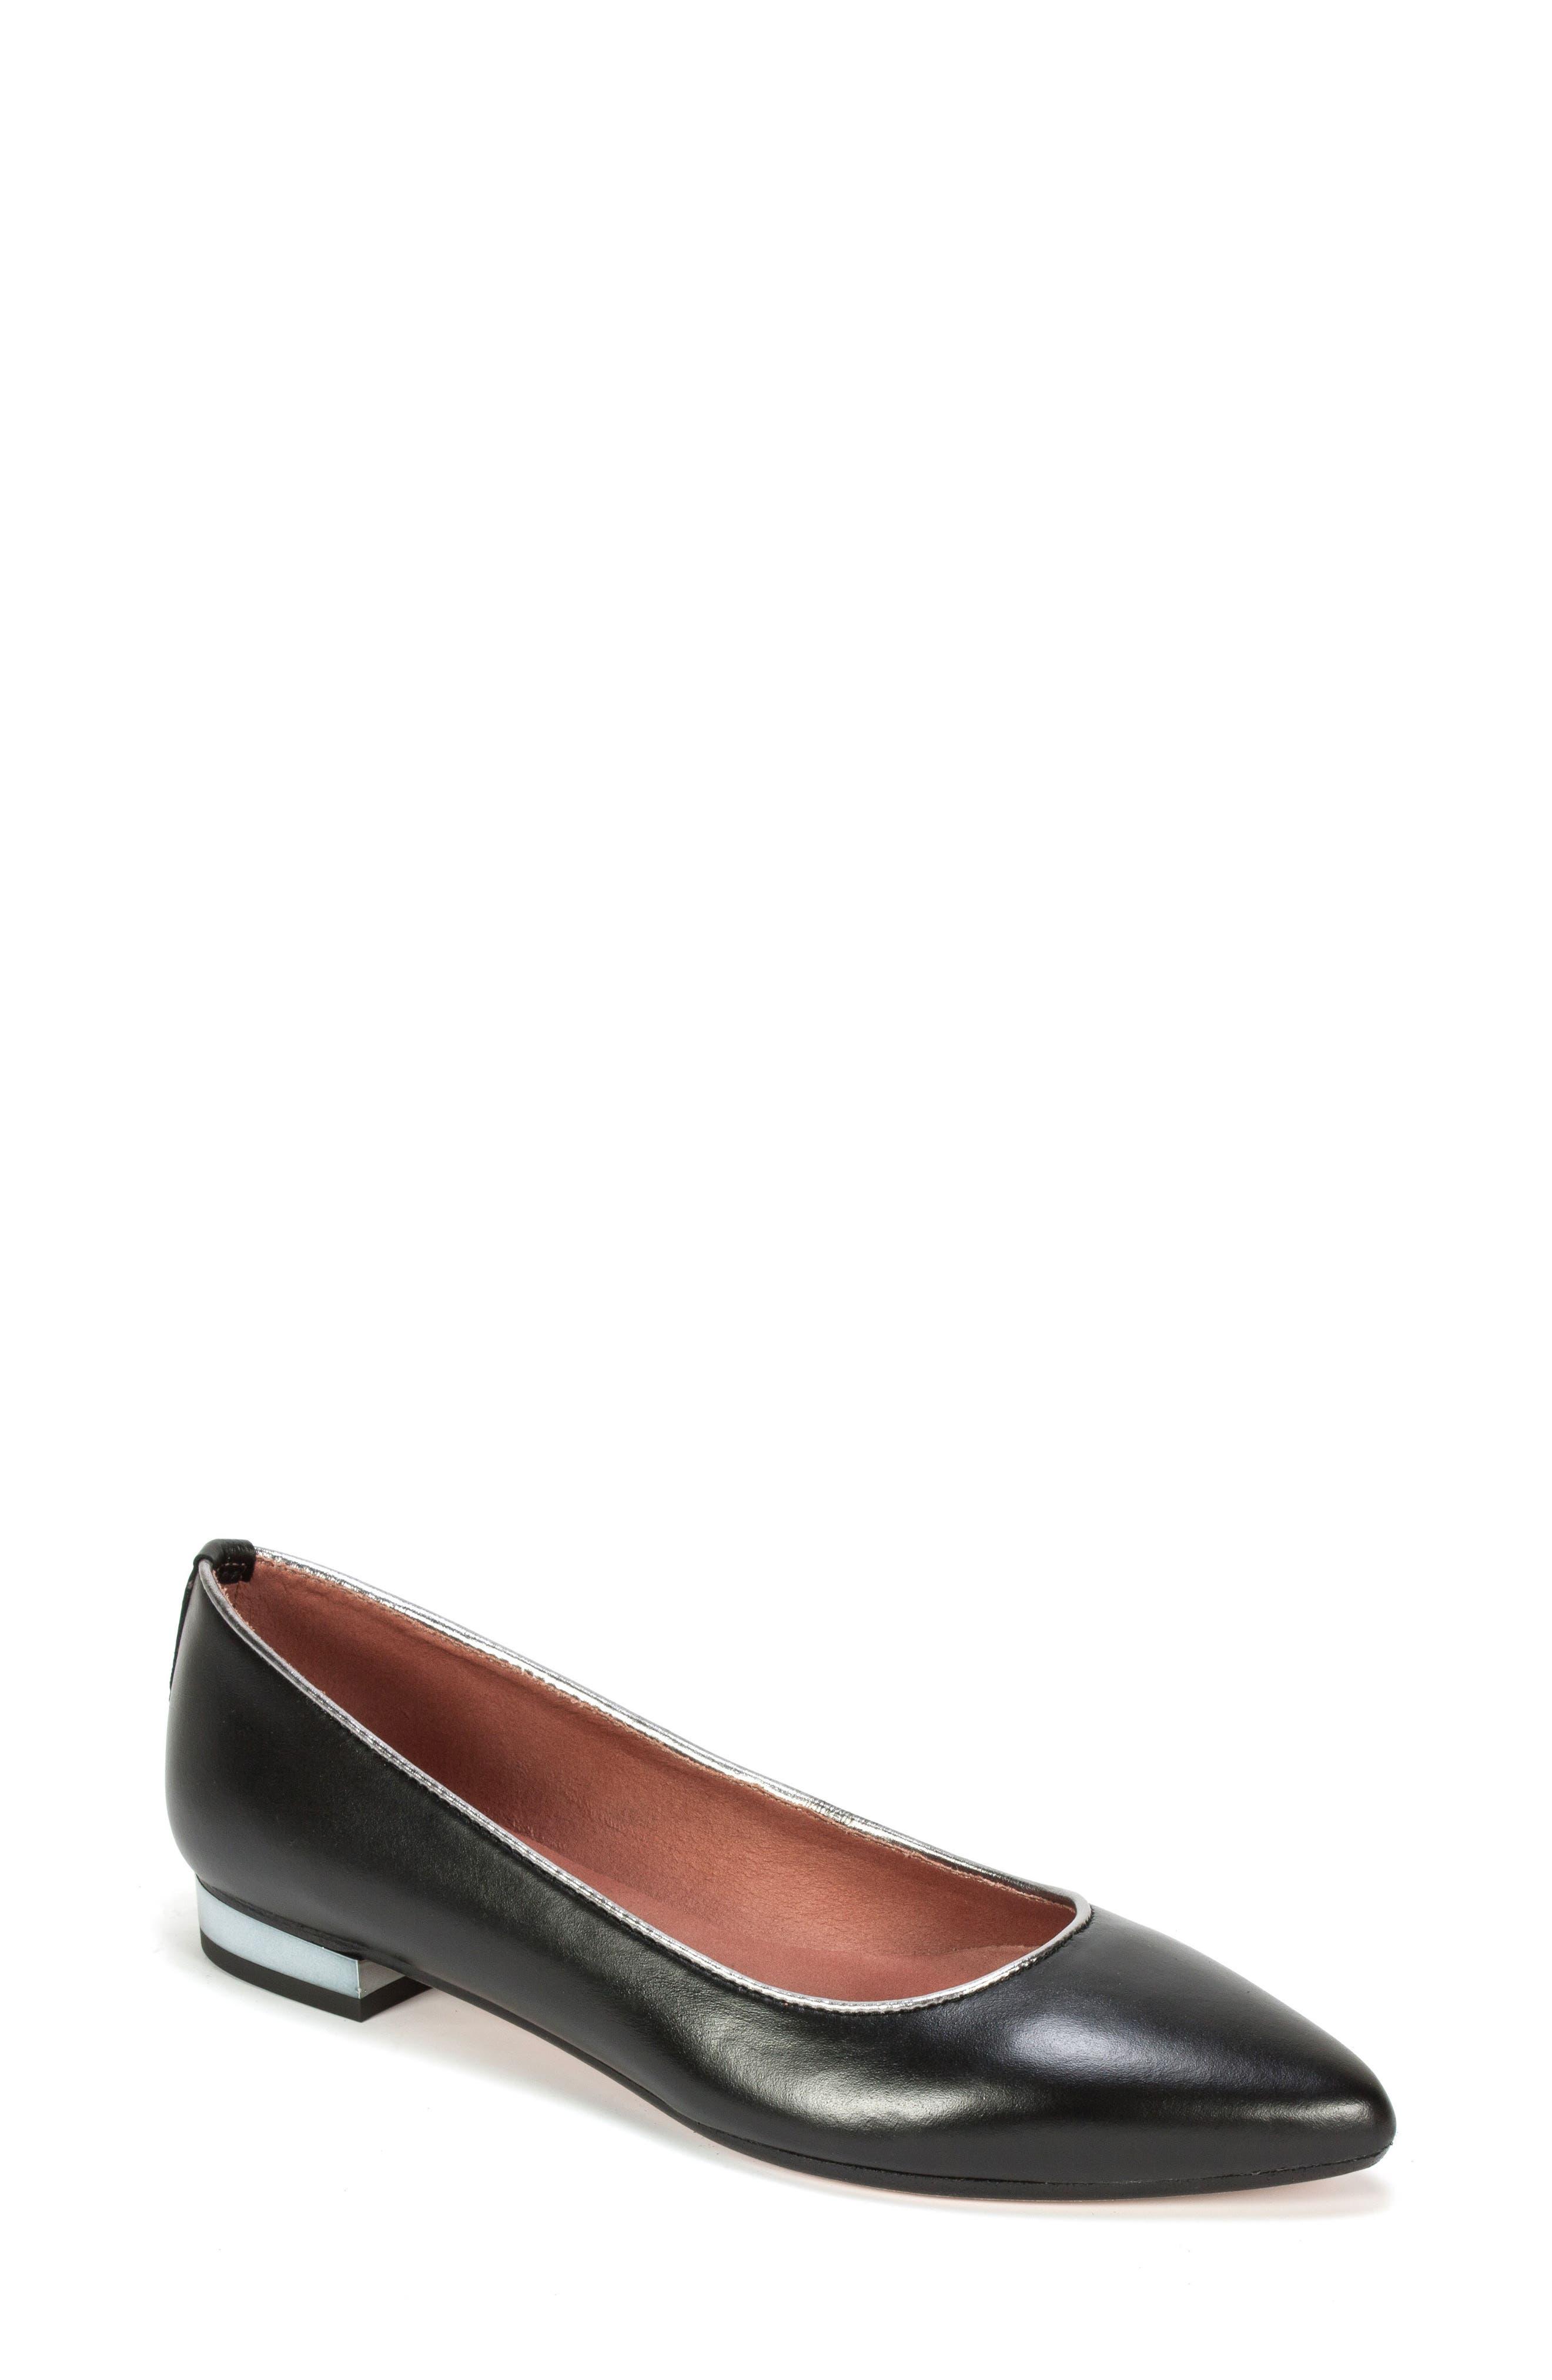 Karolina Flat,                             Main thumbnail 1, color,                             Black Leather